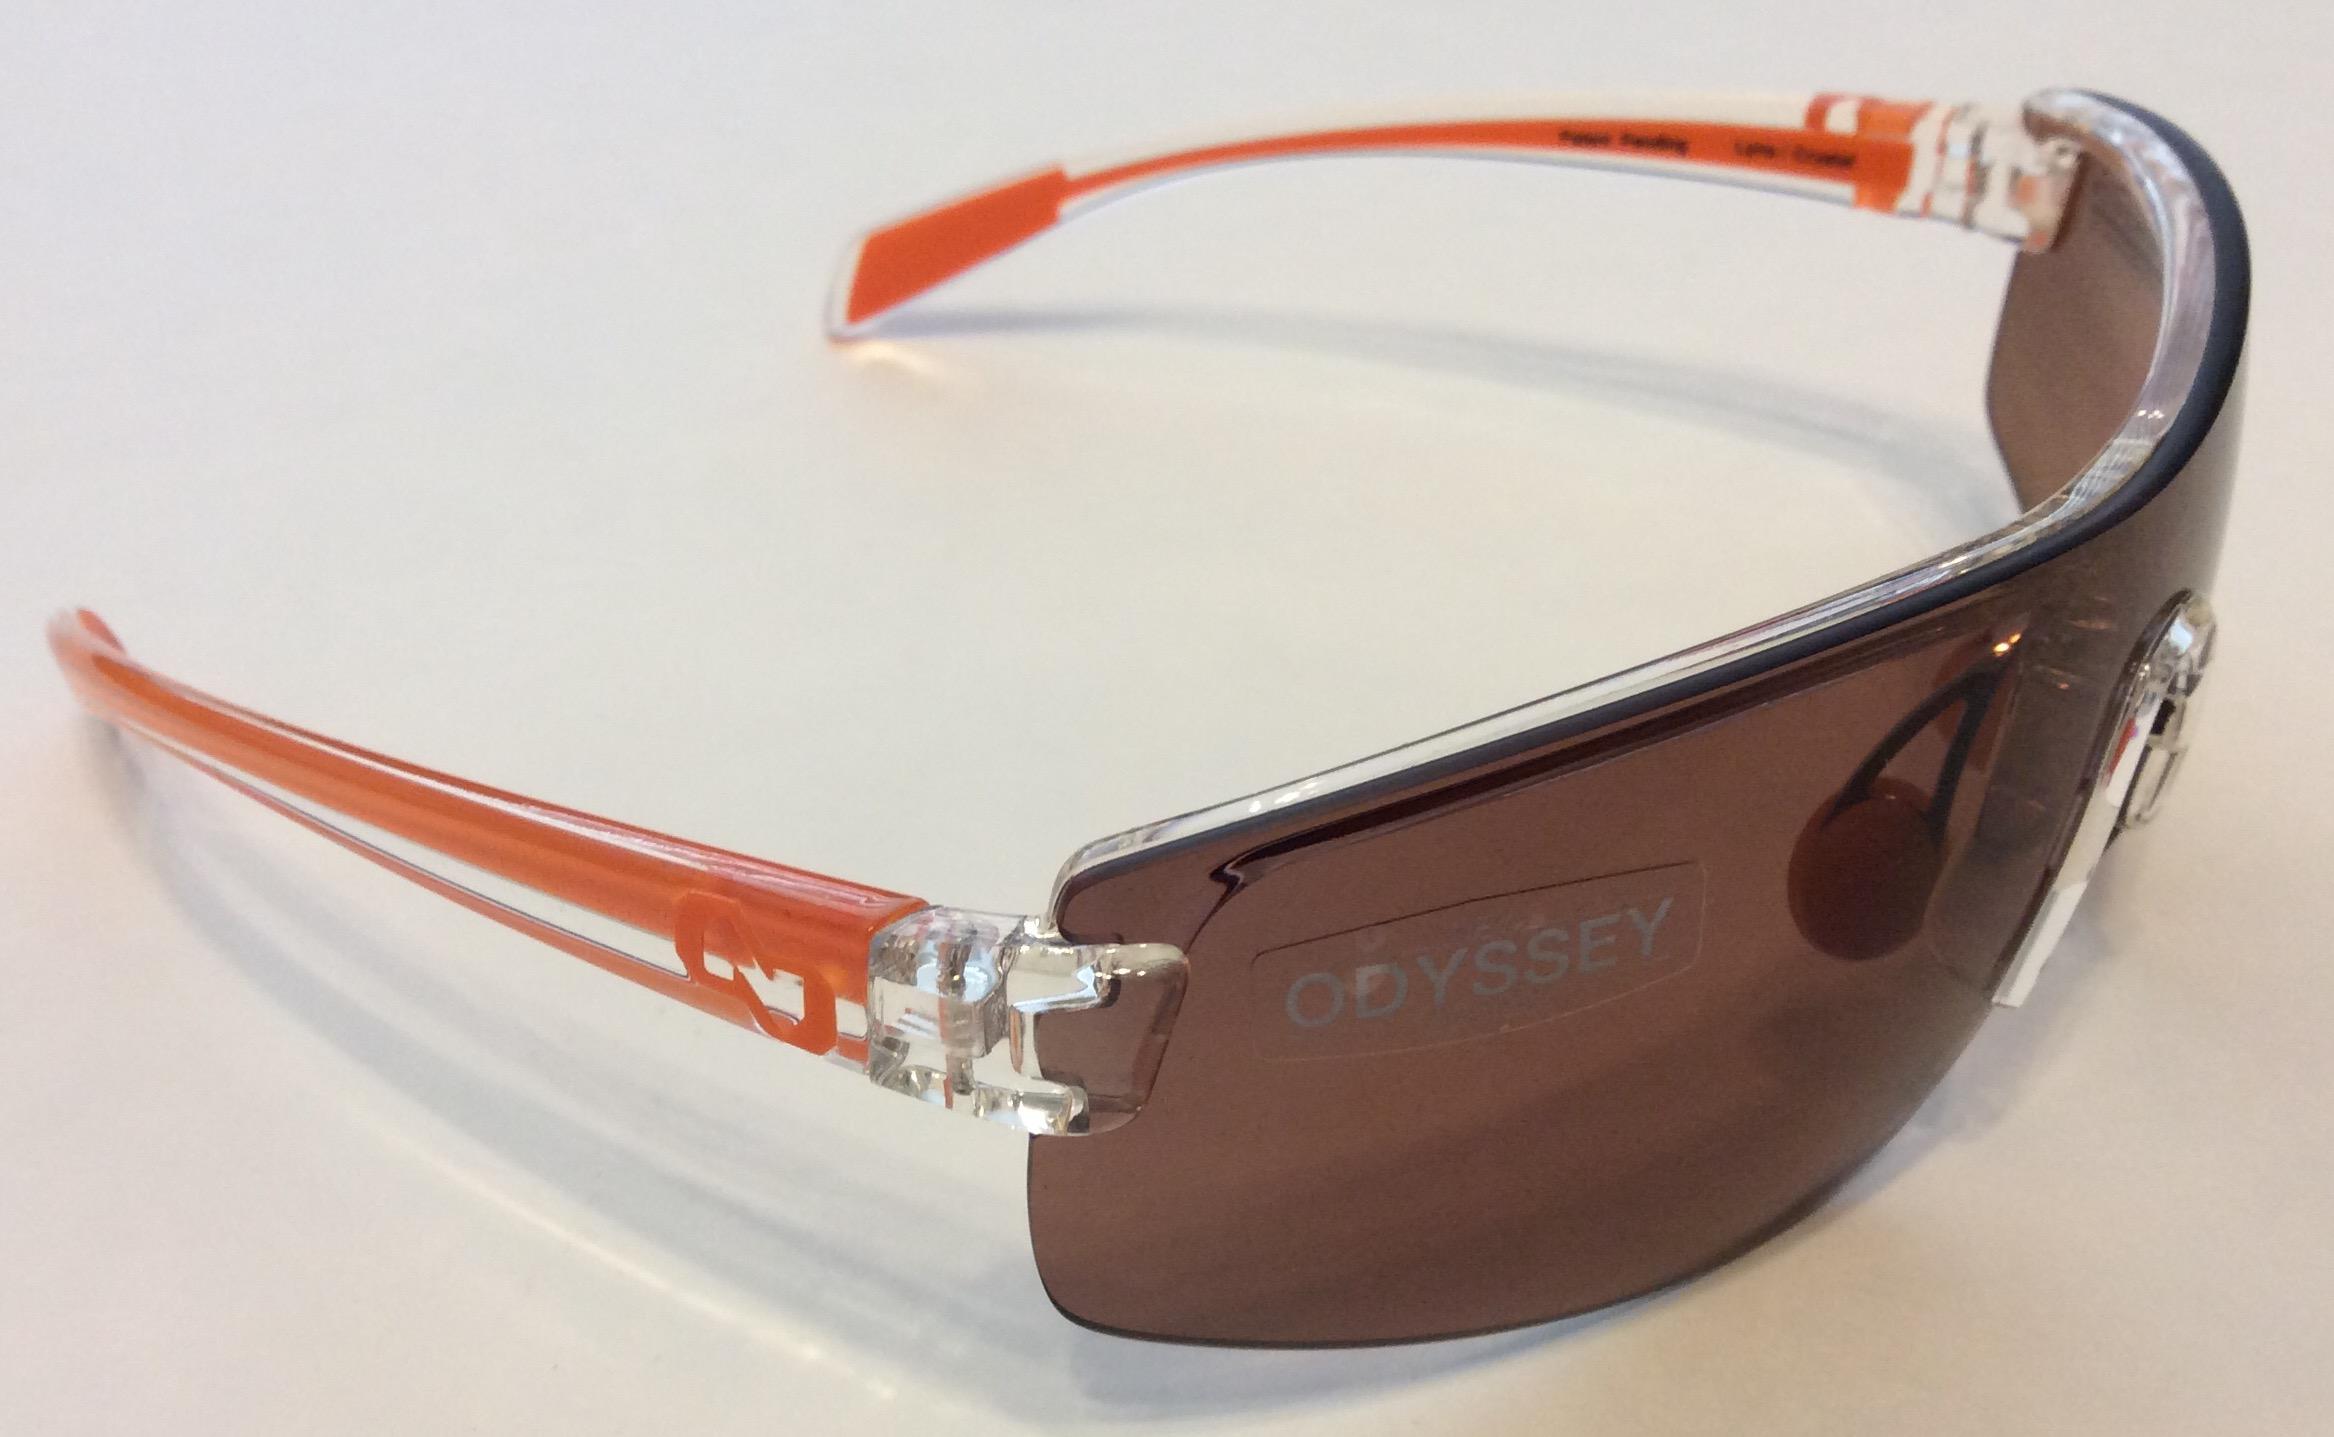 d4cd3eab612 Native Lynx Sunglasses